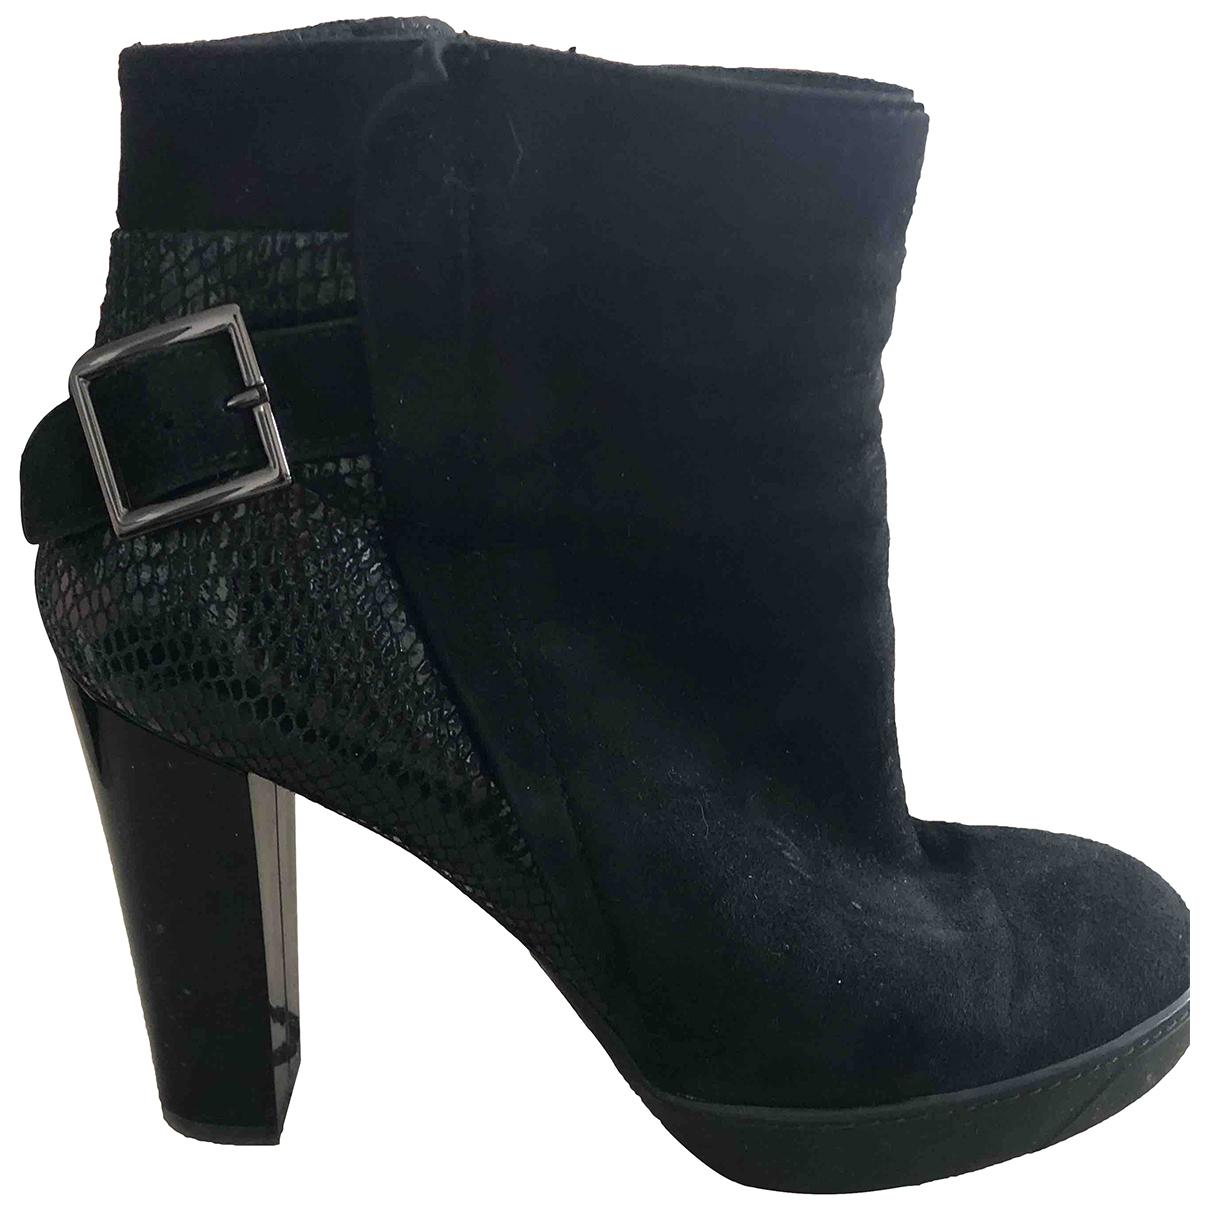 Hogan \N Black Suede Ankle boots for Women 37 EU